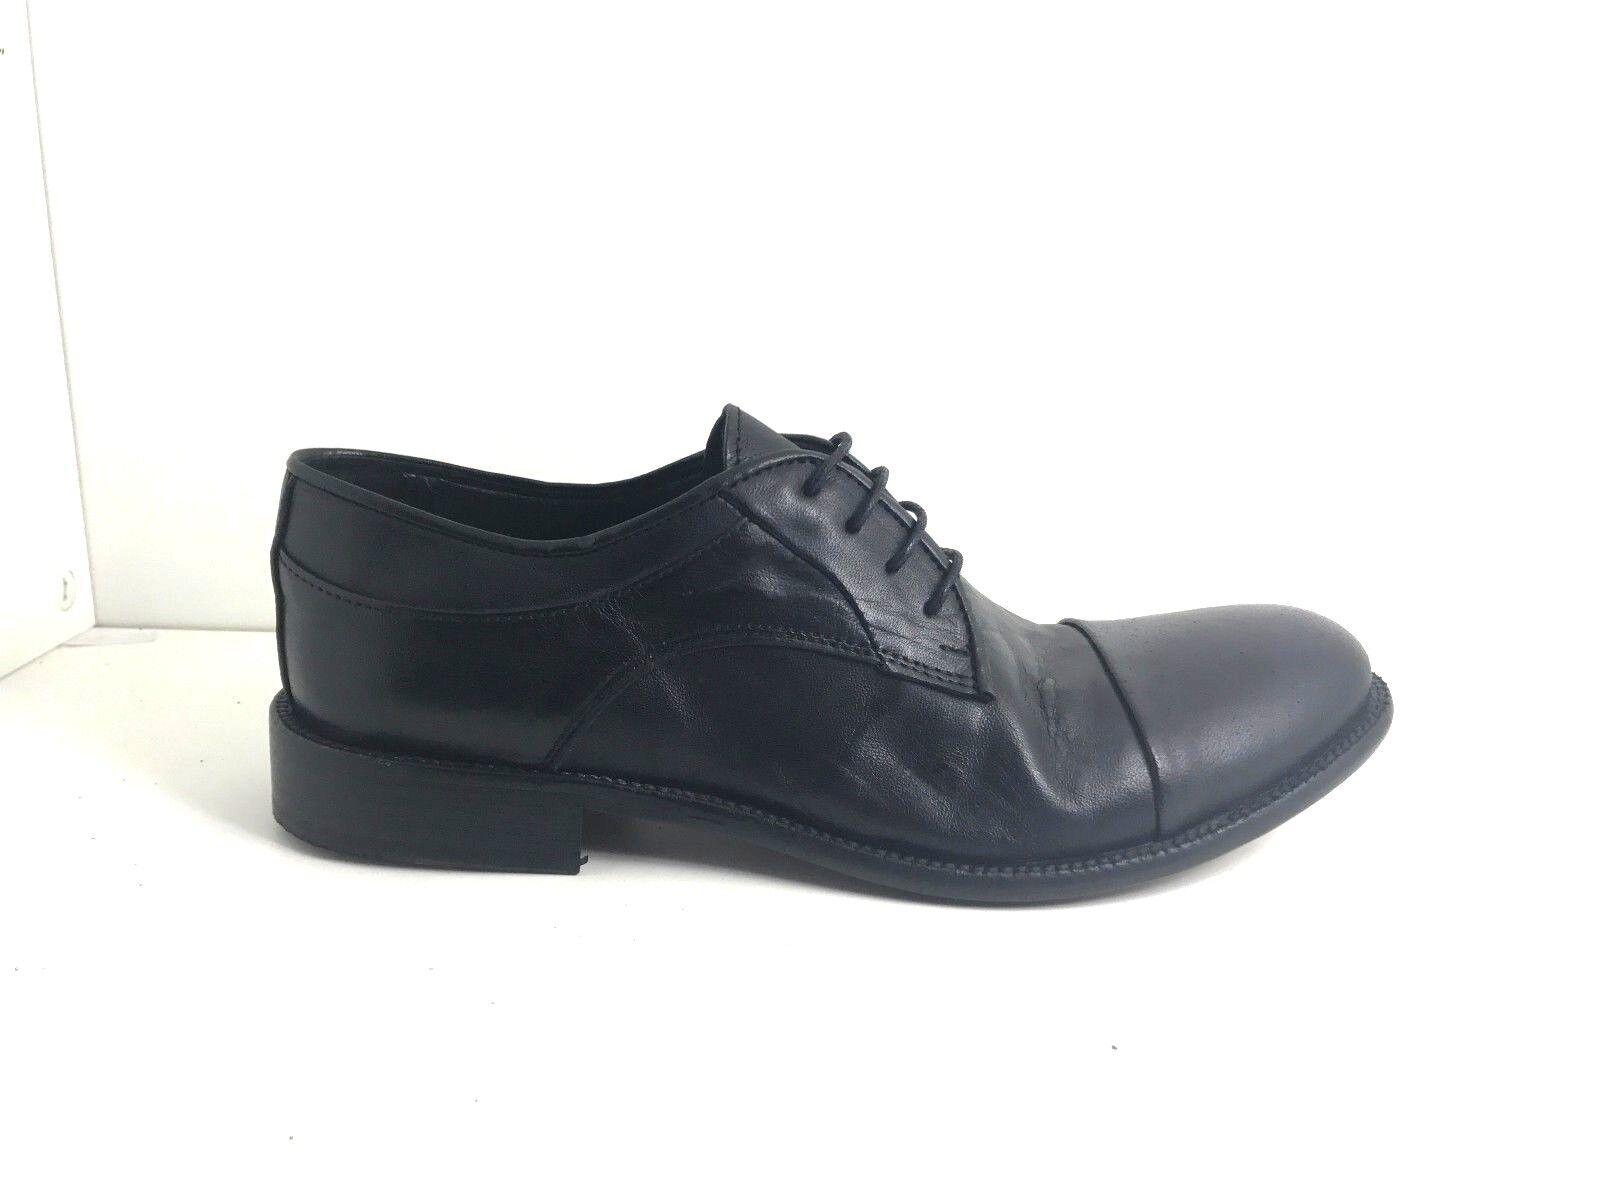 Prem1um scarpe classiche classic uomo shoes made in italy uomo classic man pelle leather 100% b9cd0f